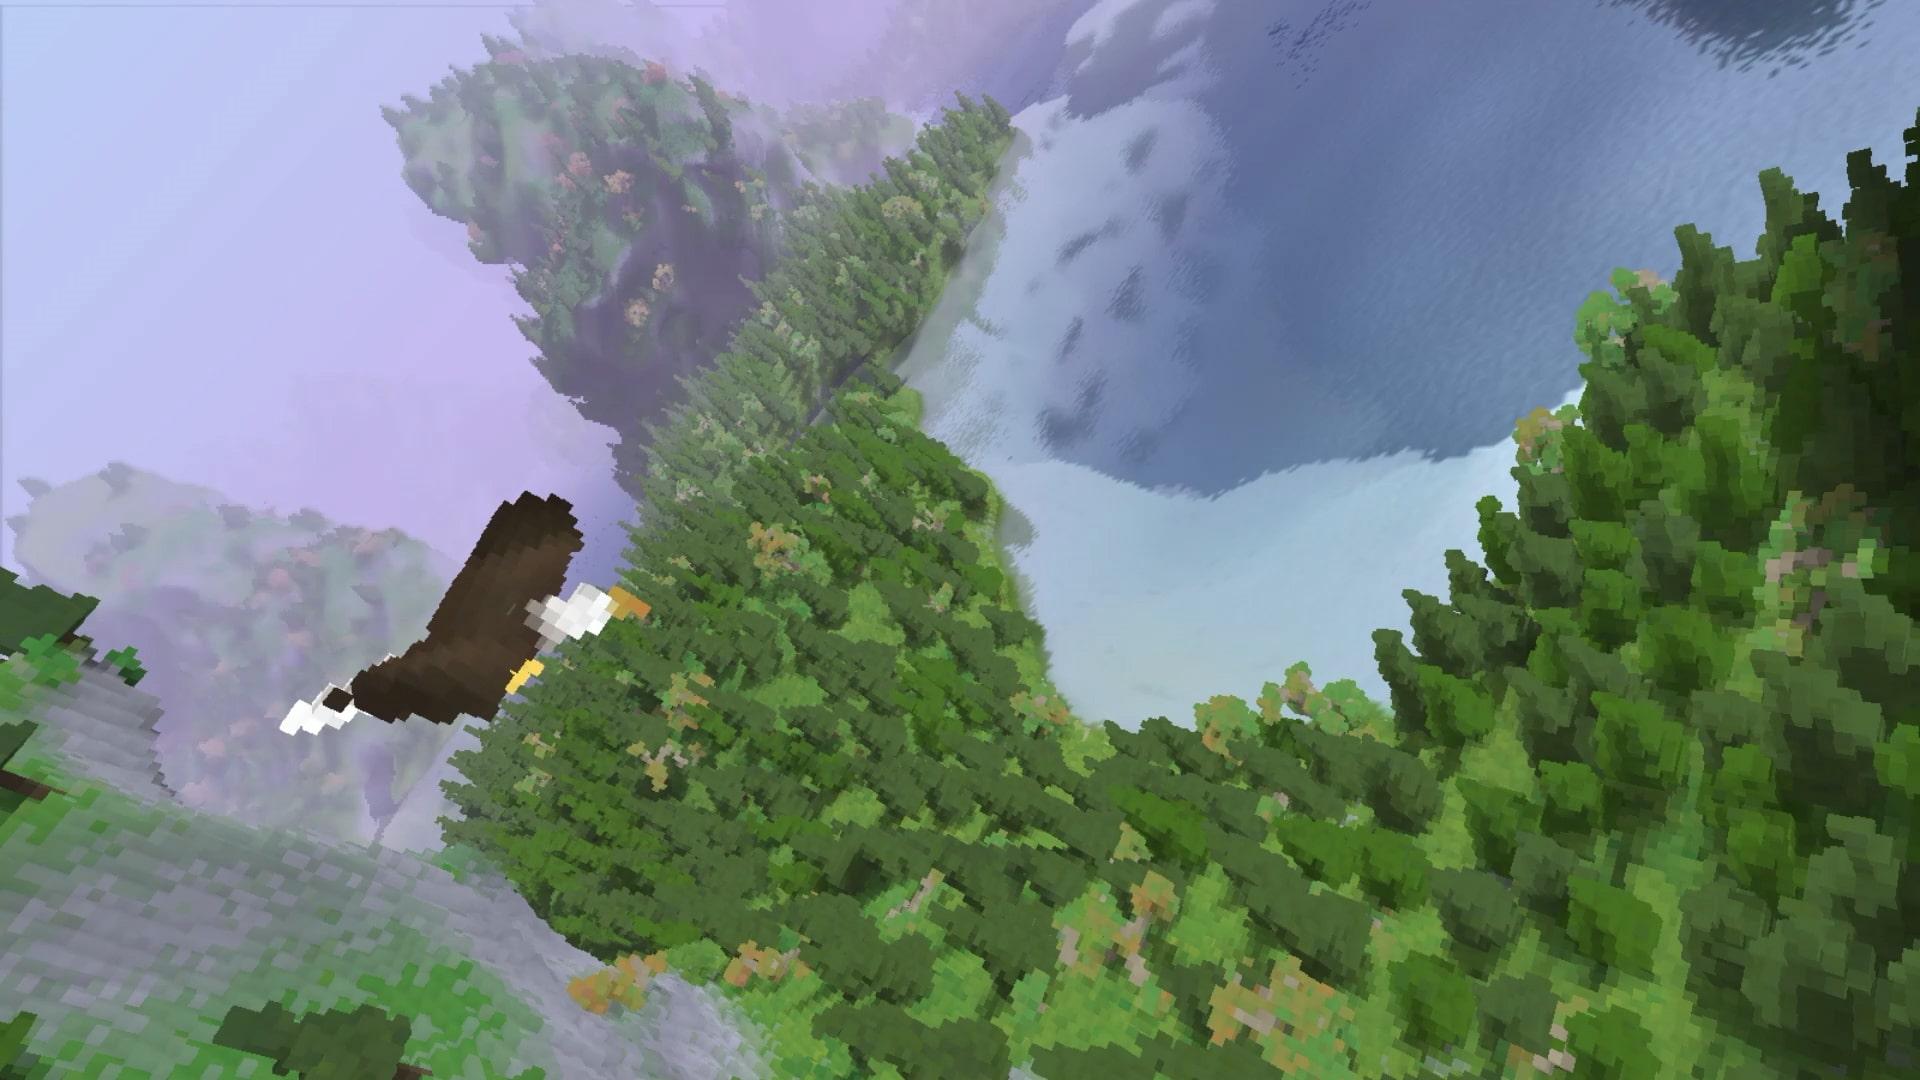 Fugl – Meditative bird flying game » FREE DOWNLOAD | CRACKED-GAMES ORG